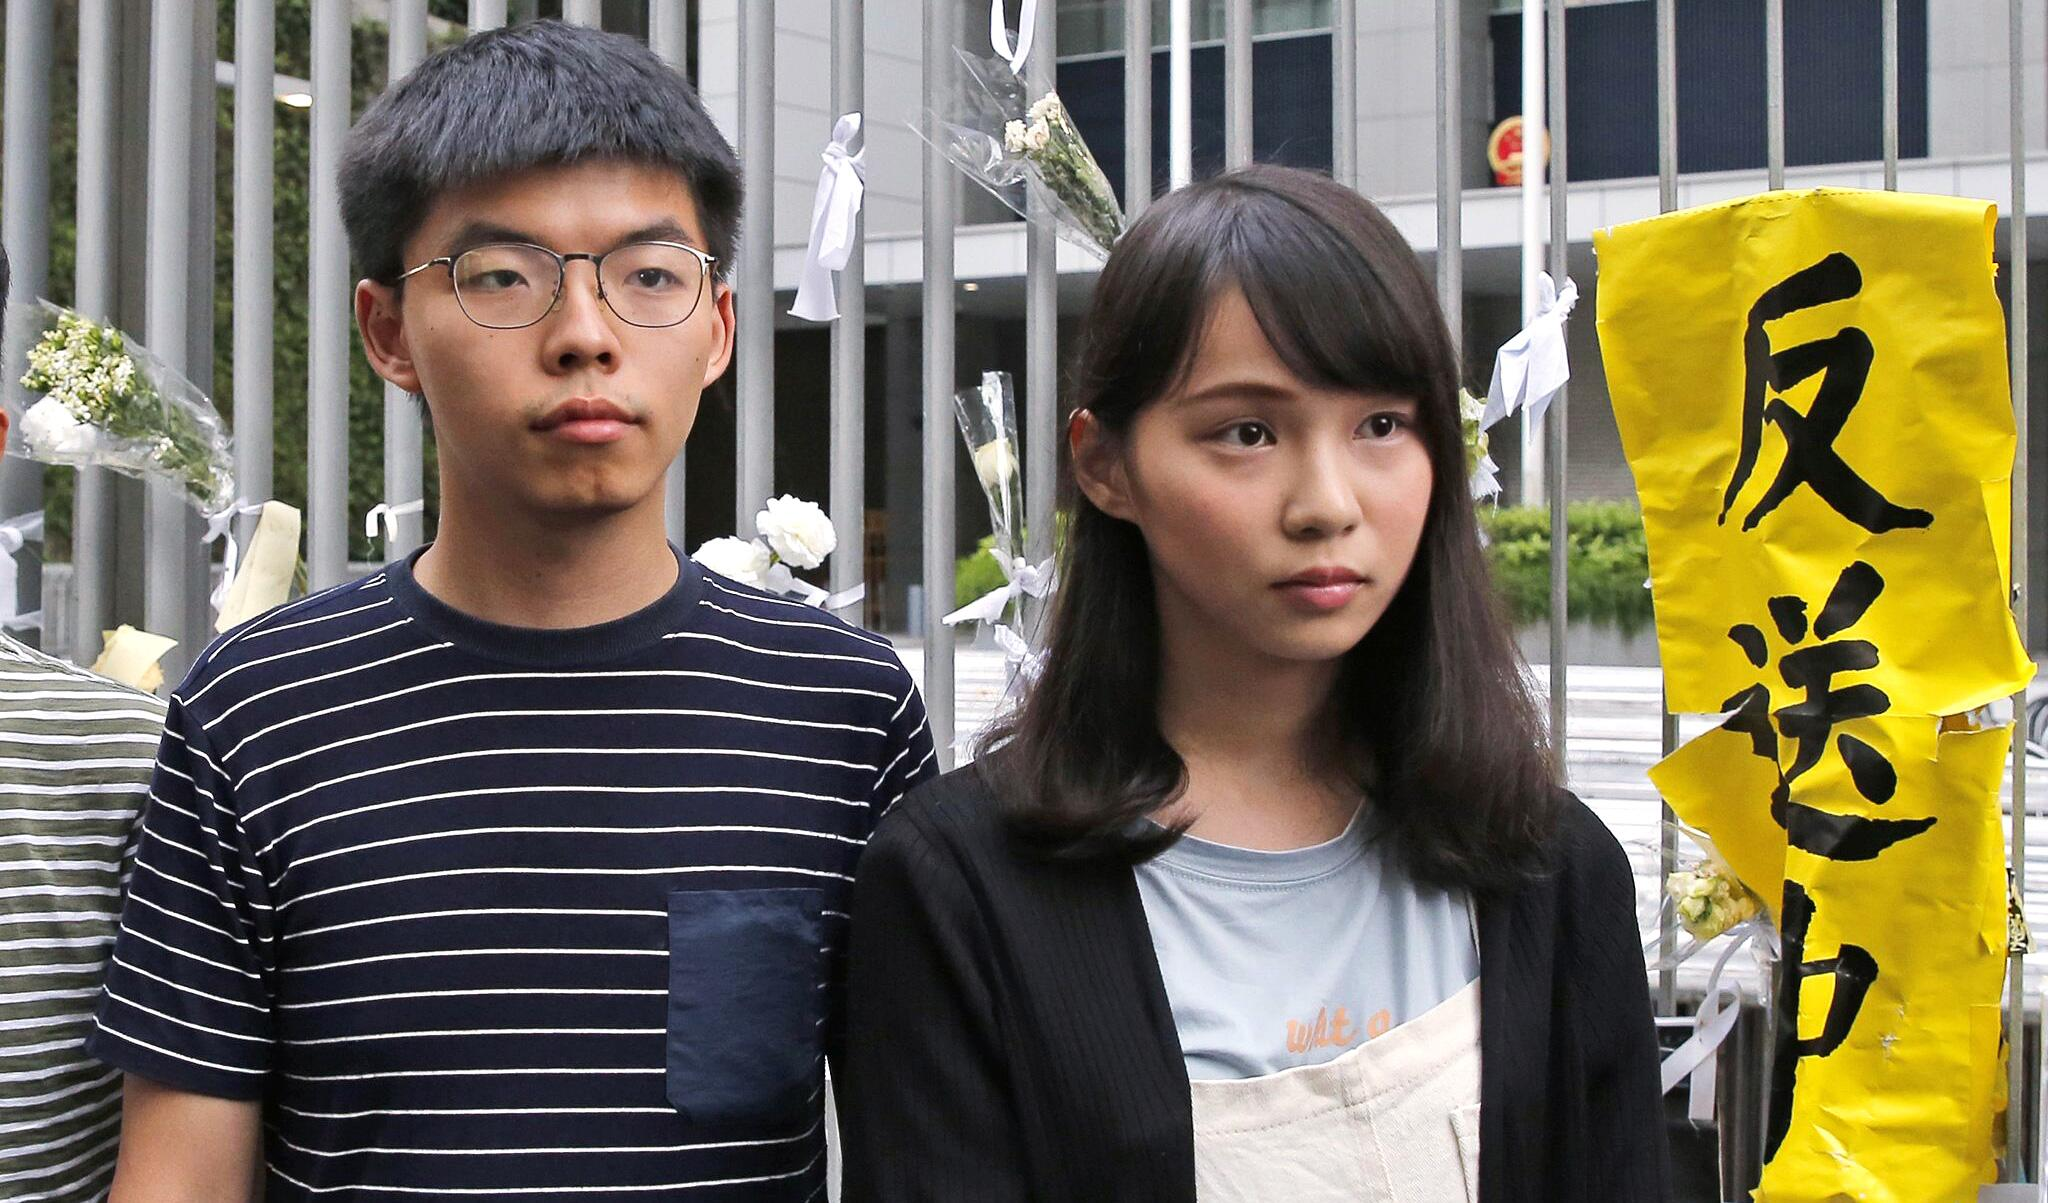 Bild zu Proteste in Hongkong - Joshua Wong und Agnes Chow